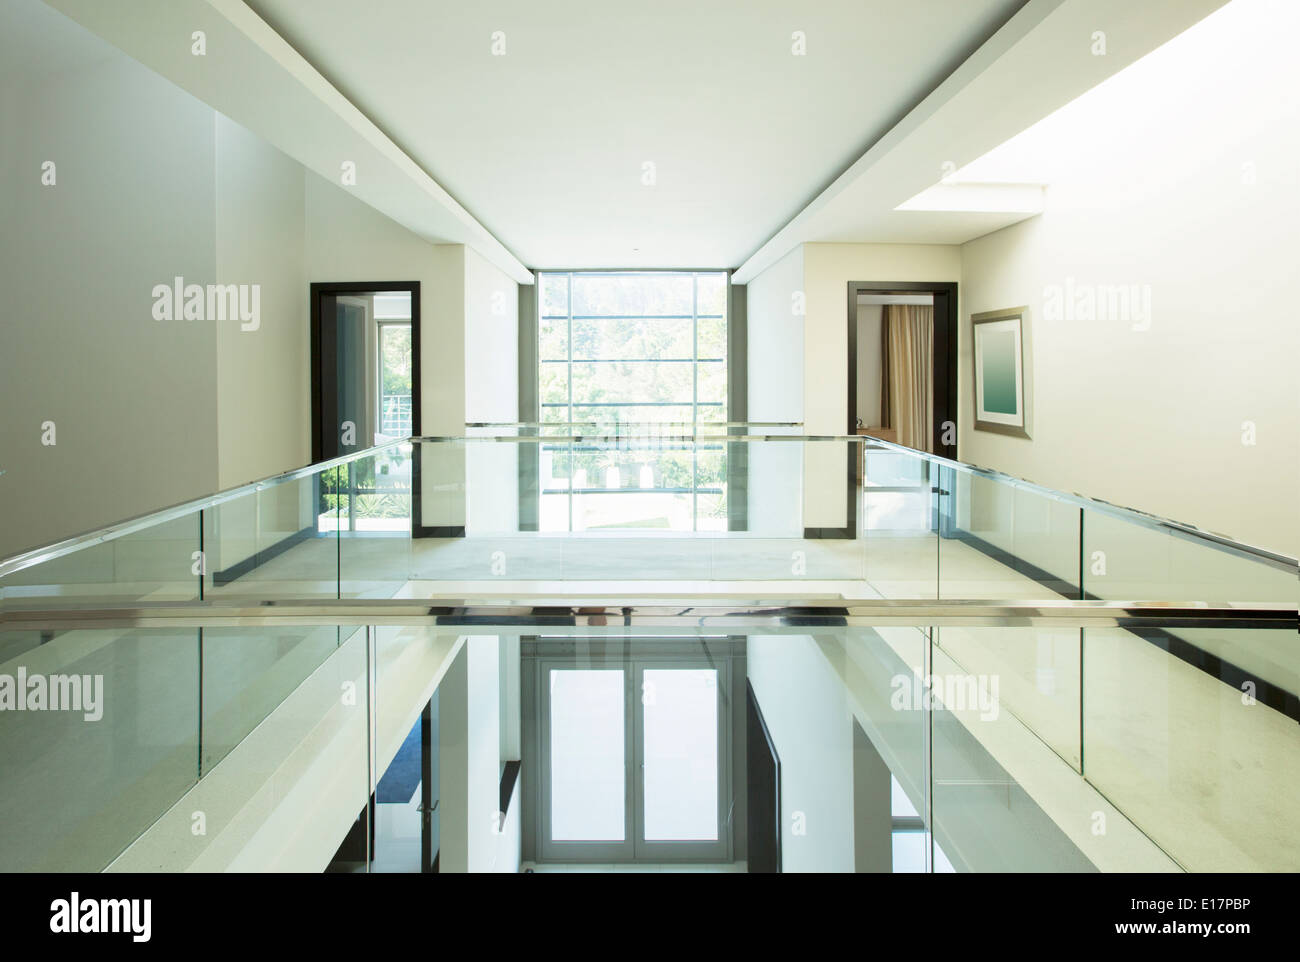 Foyer Luxury Opening Hours : Modern balcony and open foyer in luxury home stock photo